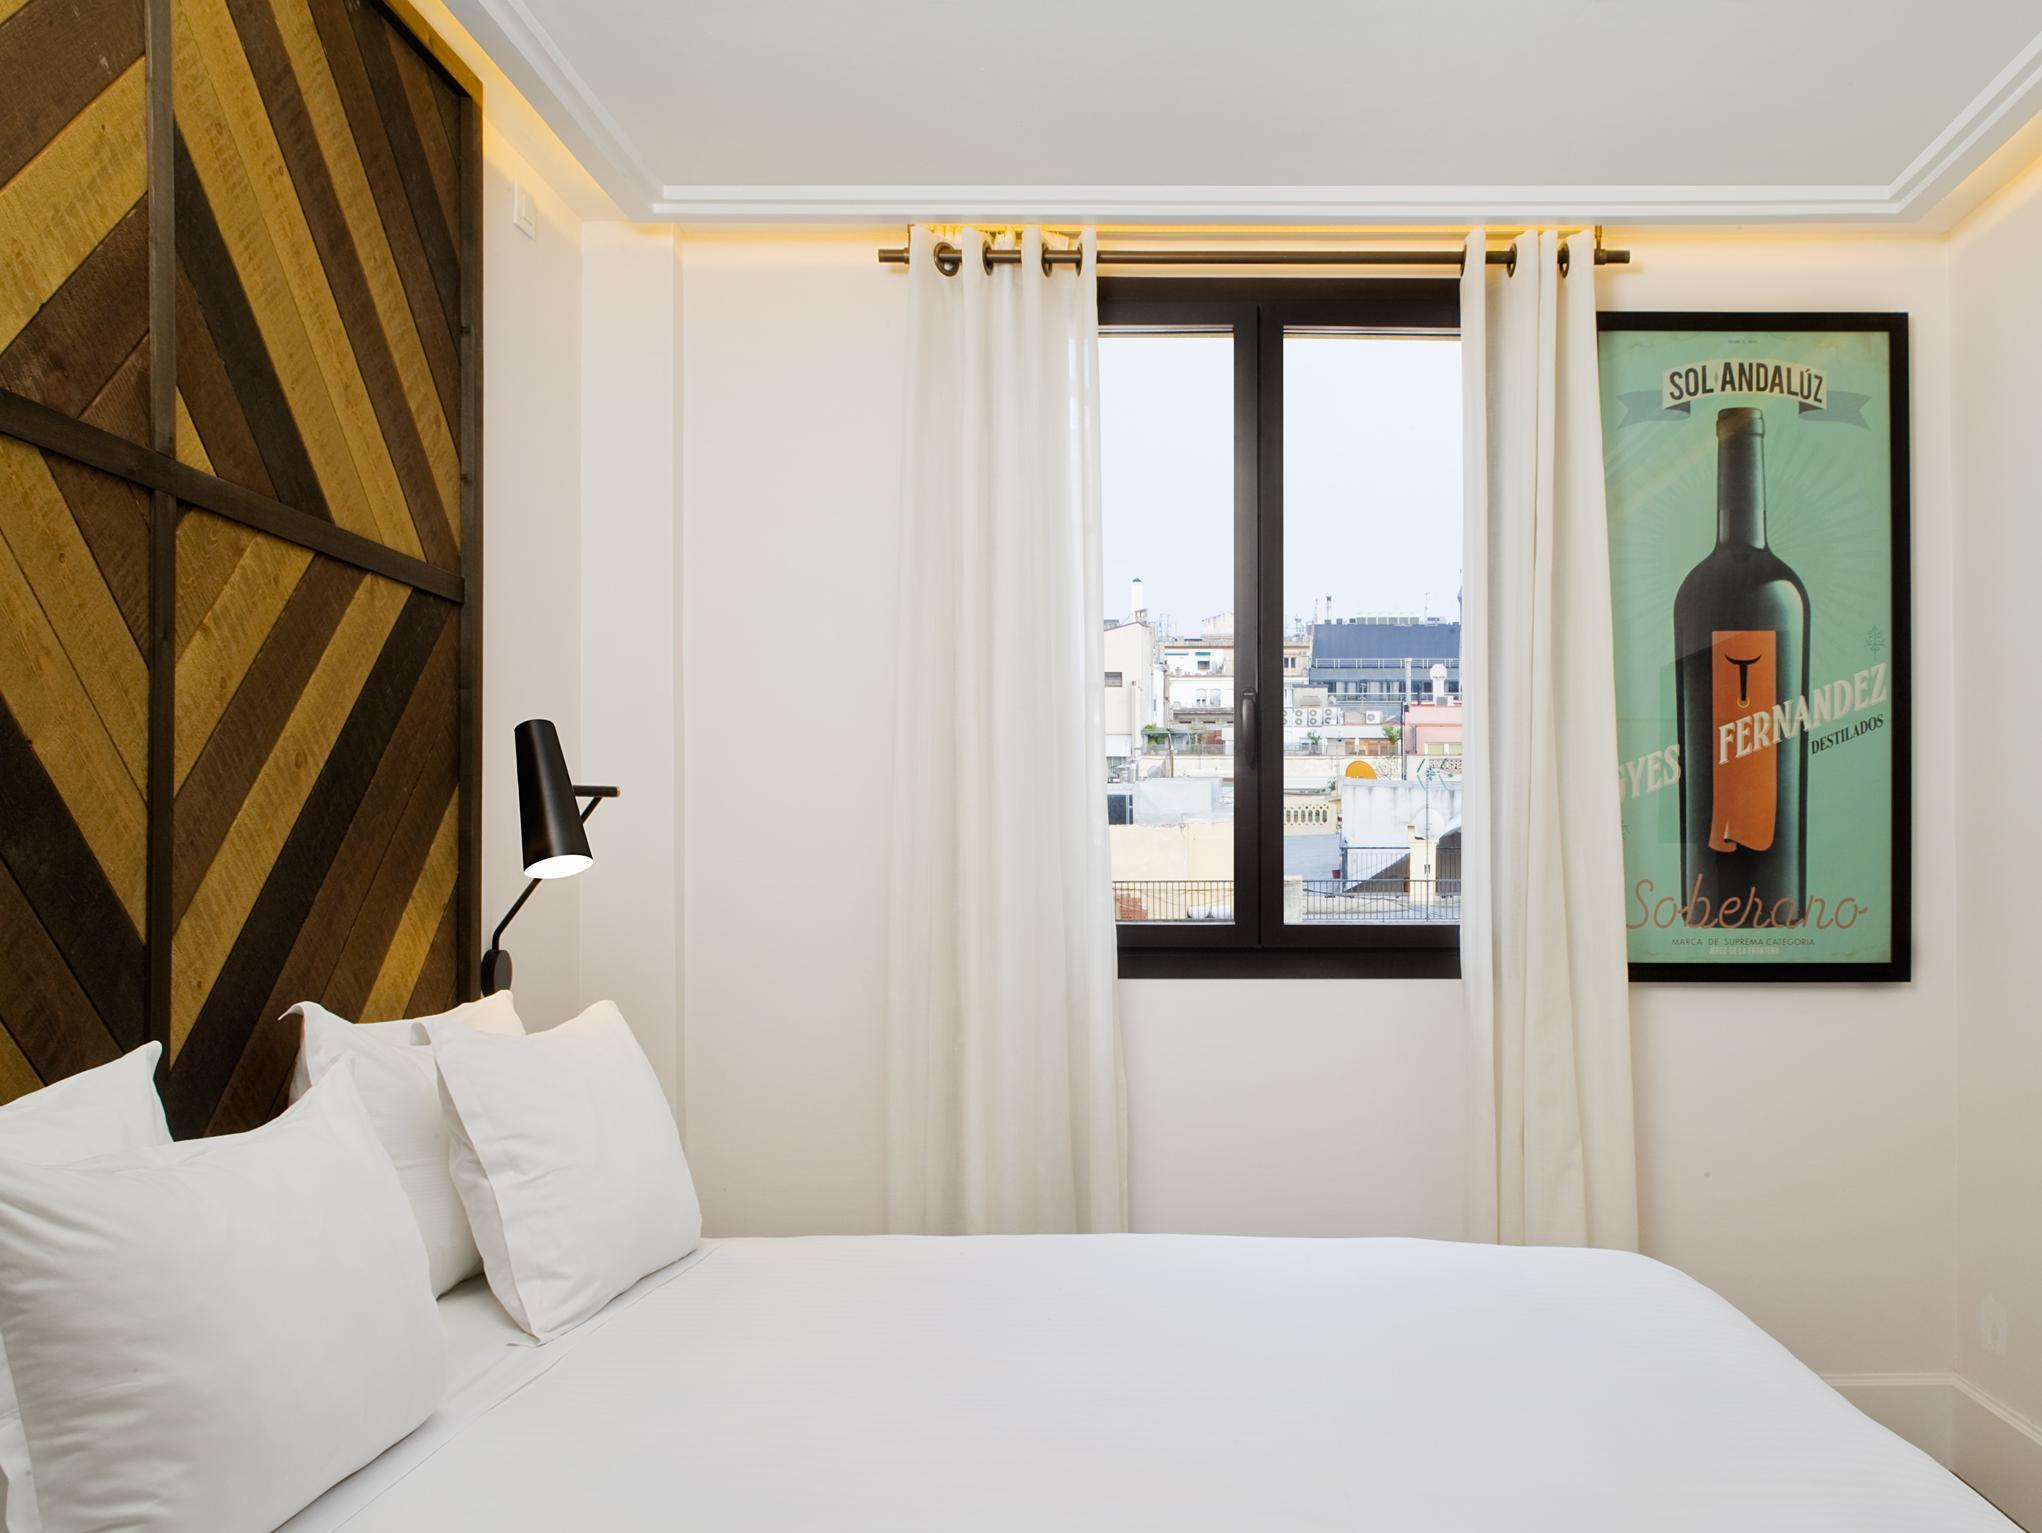 Praktik Vinoteca Hotel - Barcelona